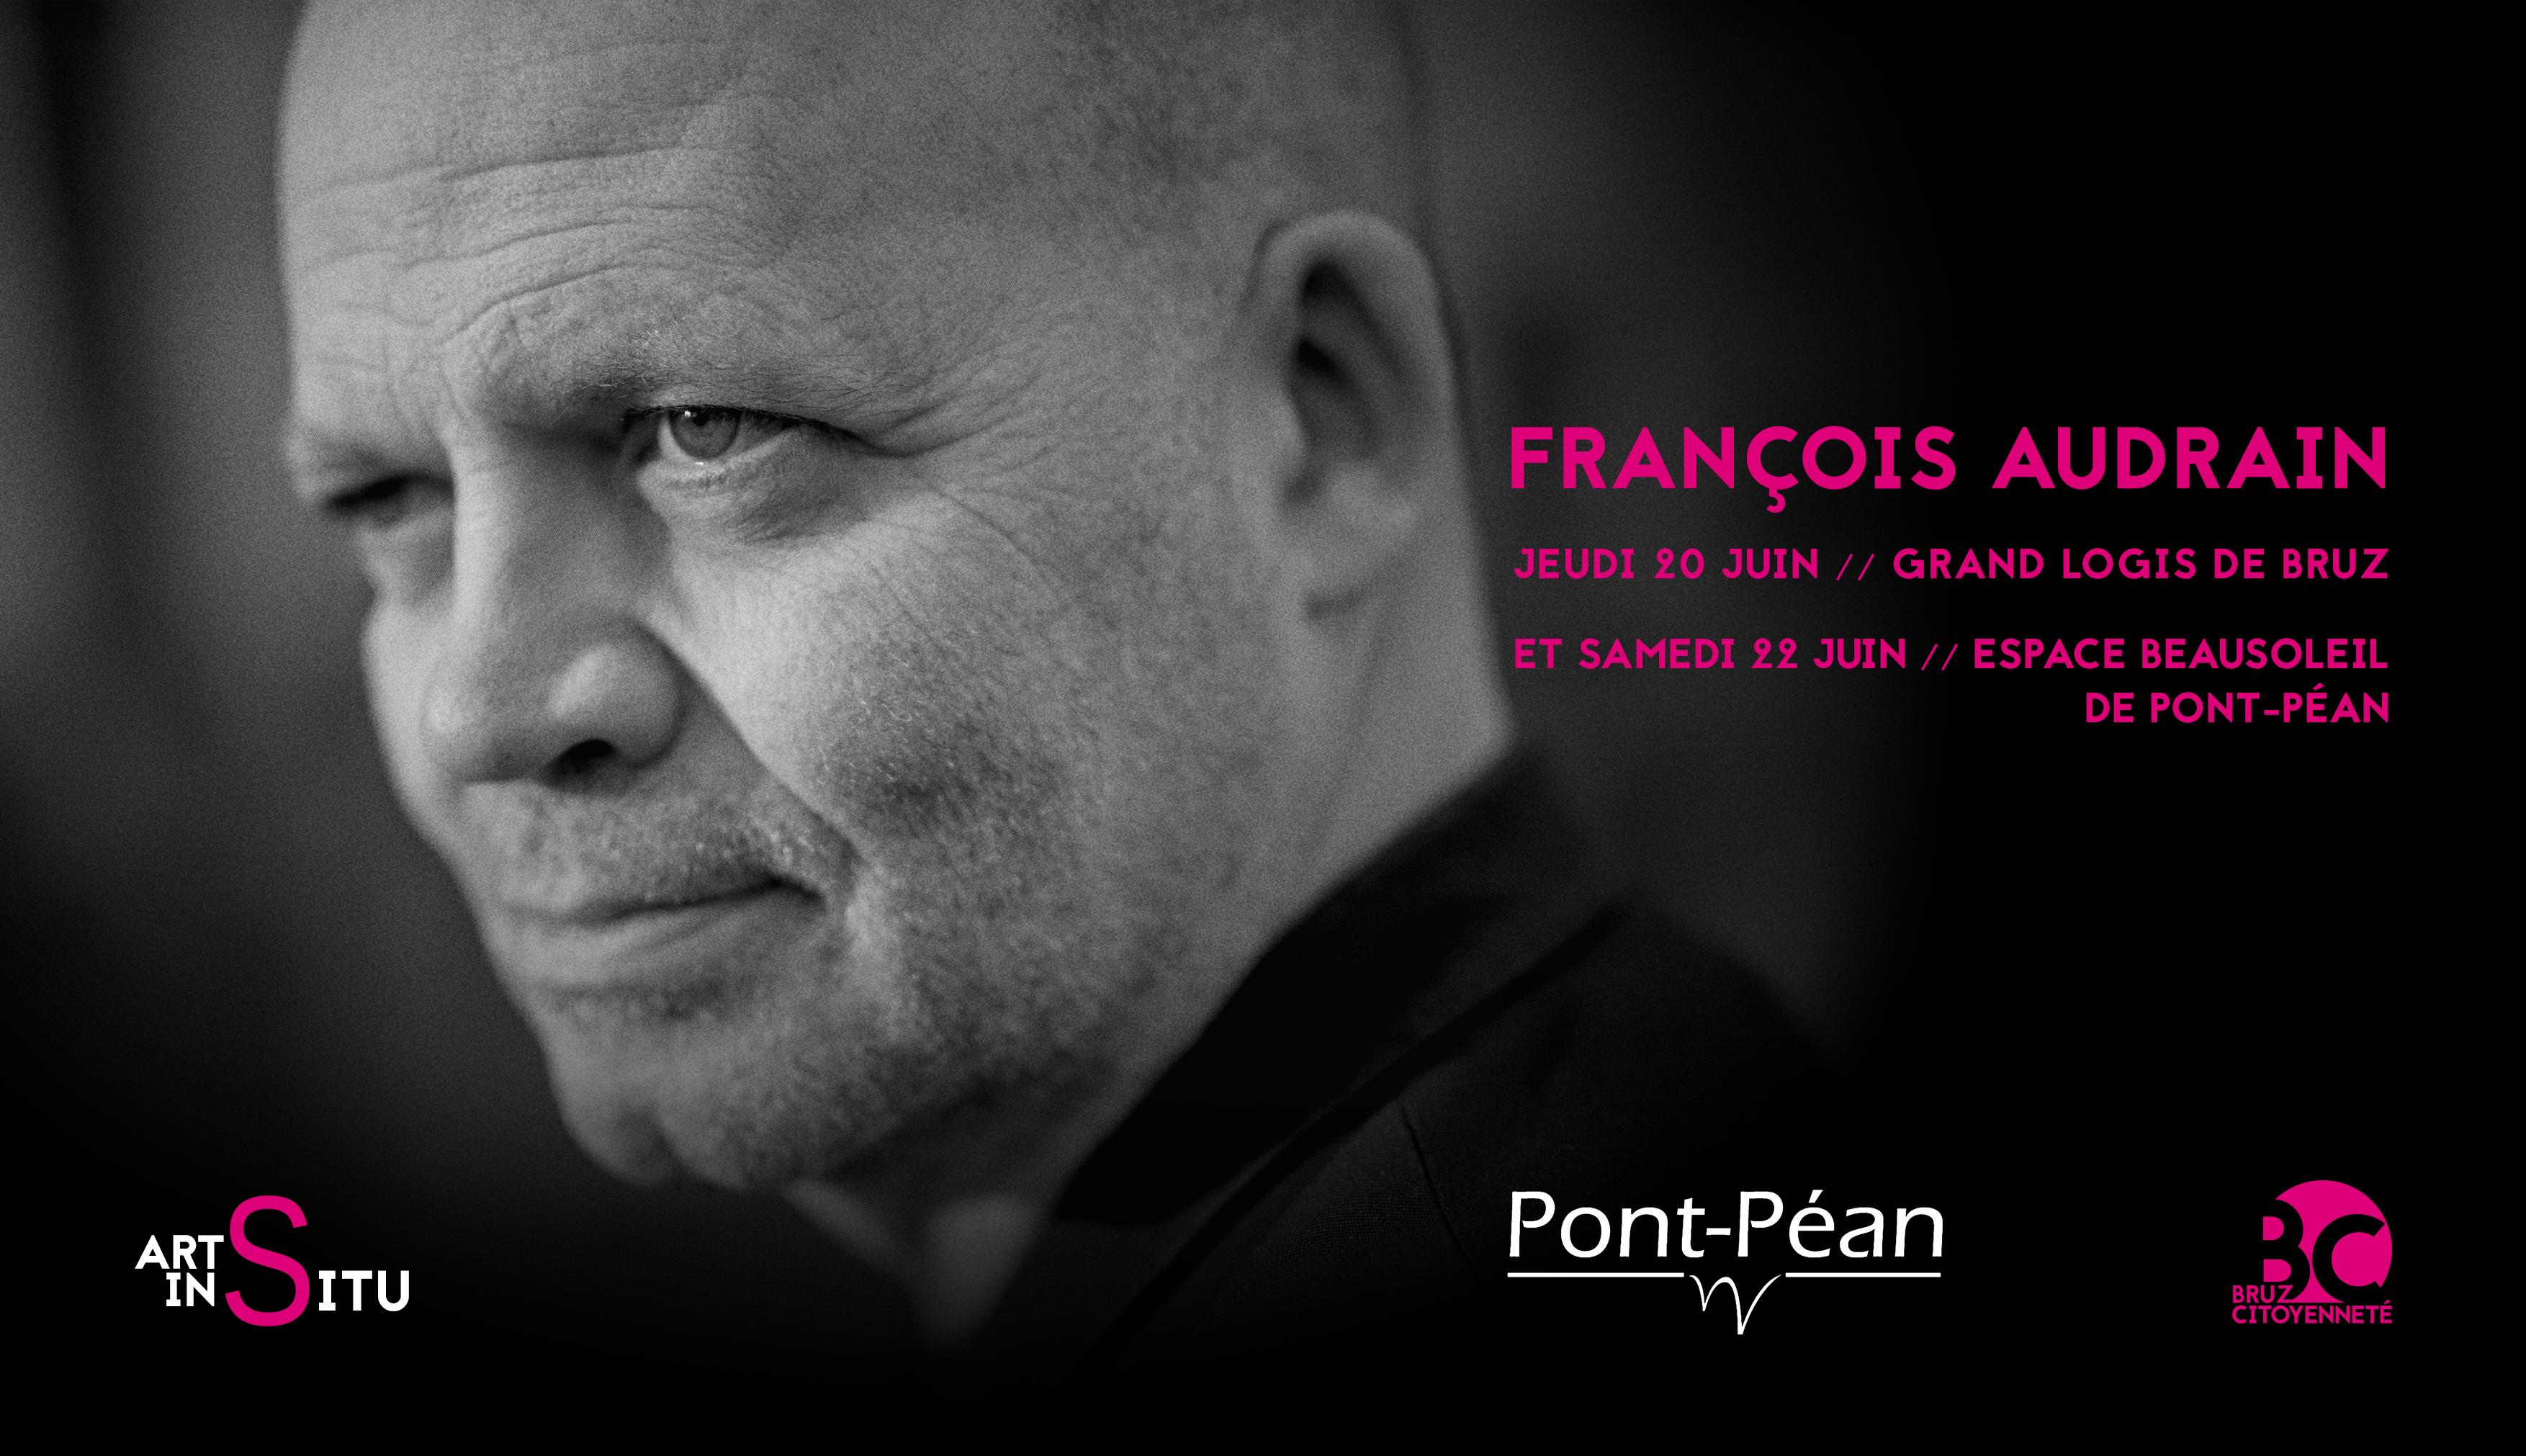 //FRANCOIS AUDRAIN//